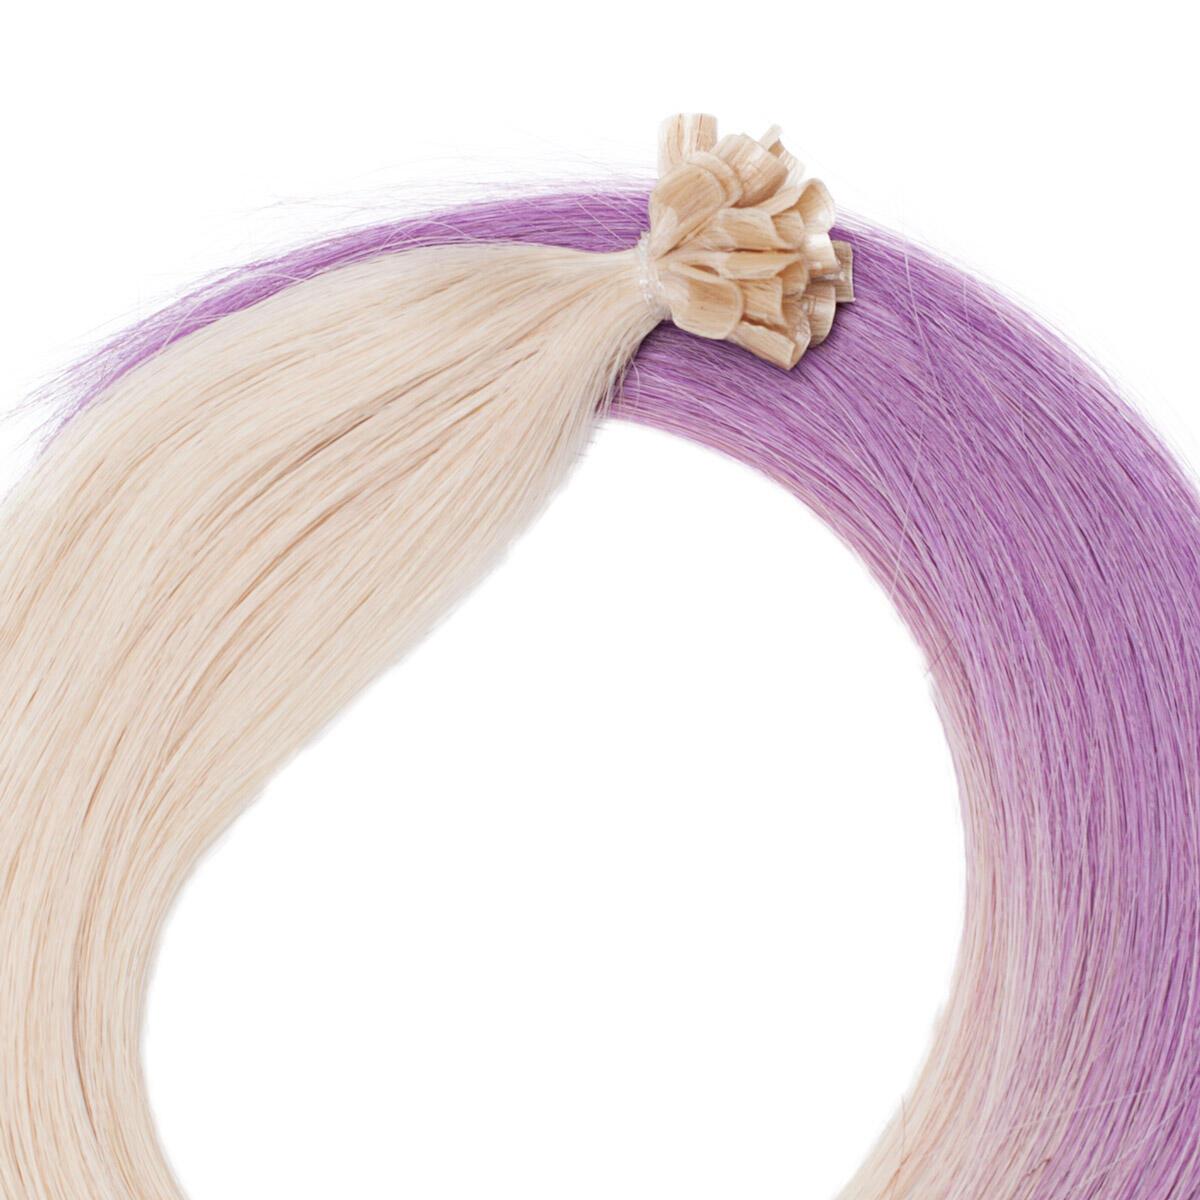 Nail Hair Original O10.8/99.3 Light Purple Ombre 40 cm